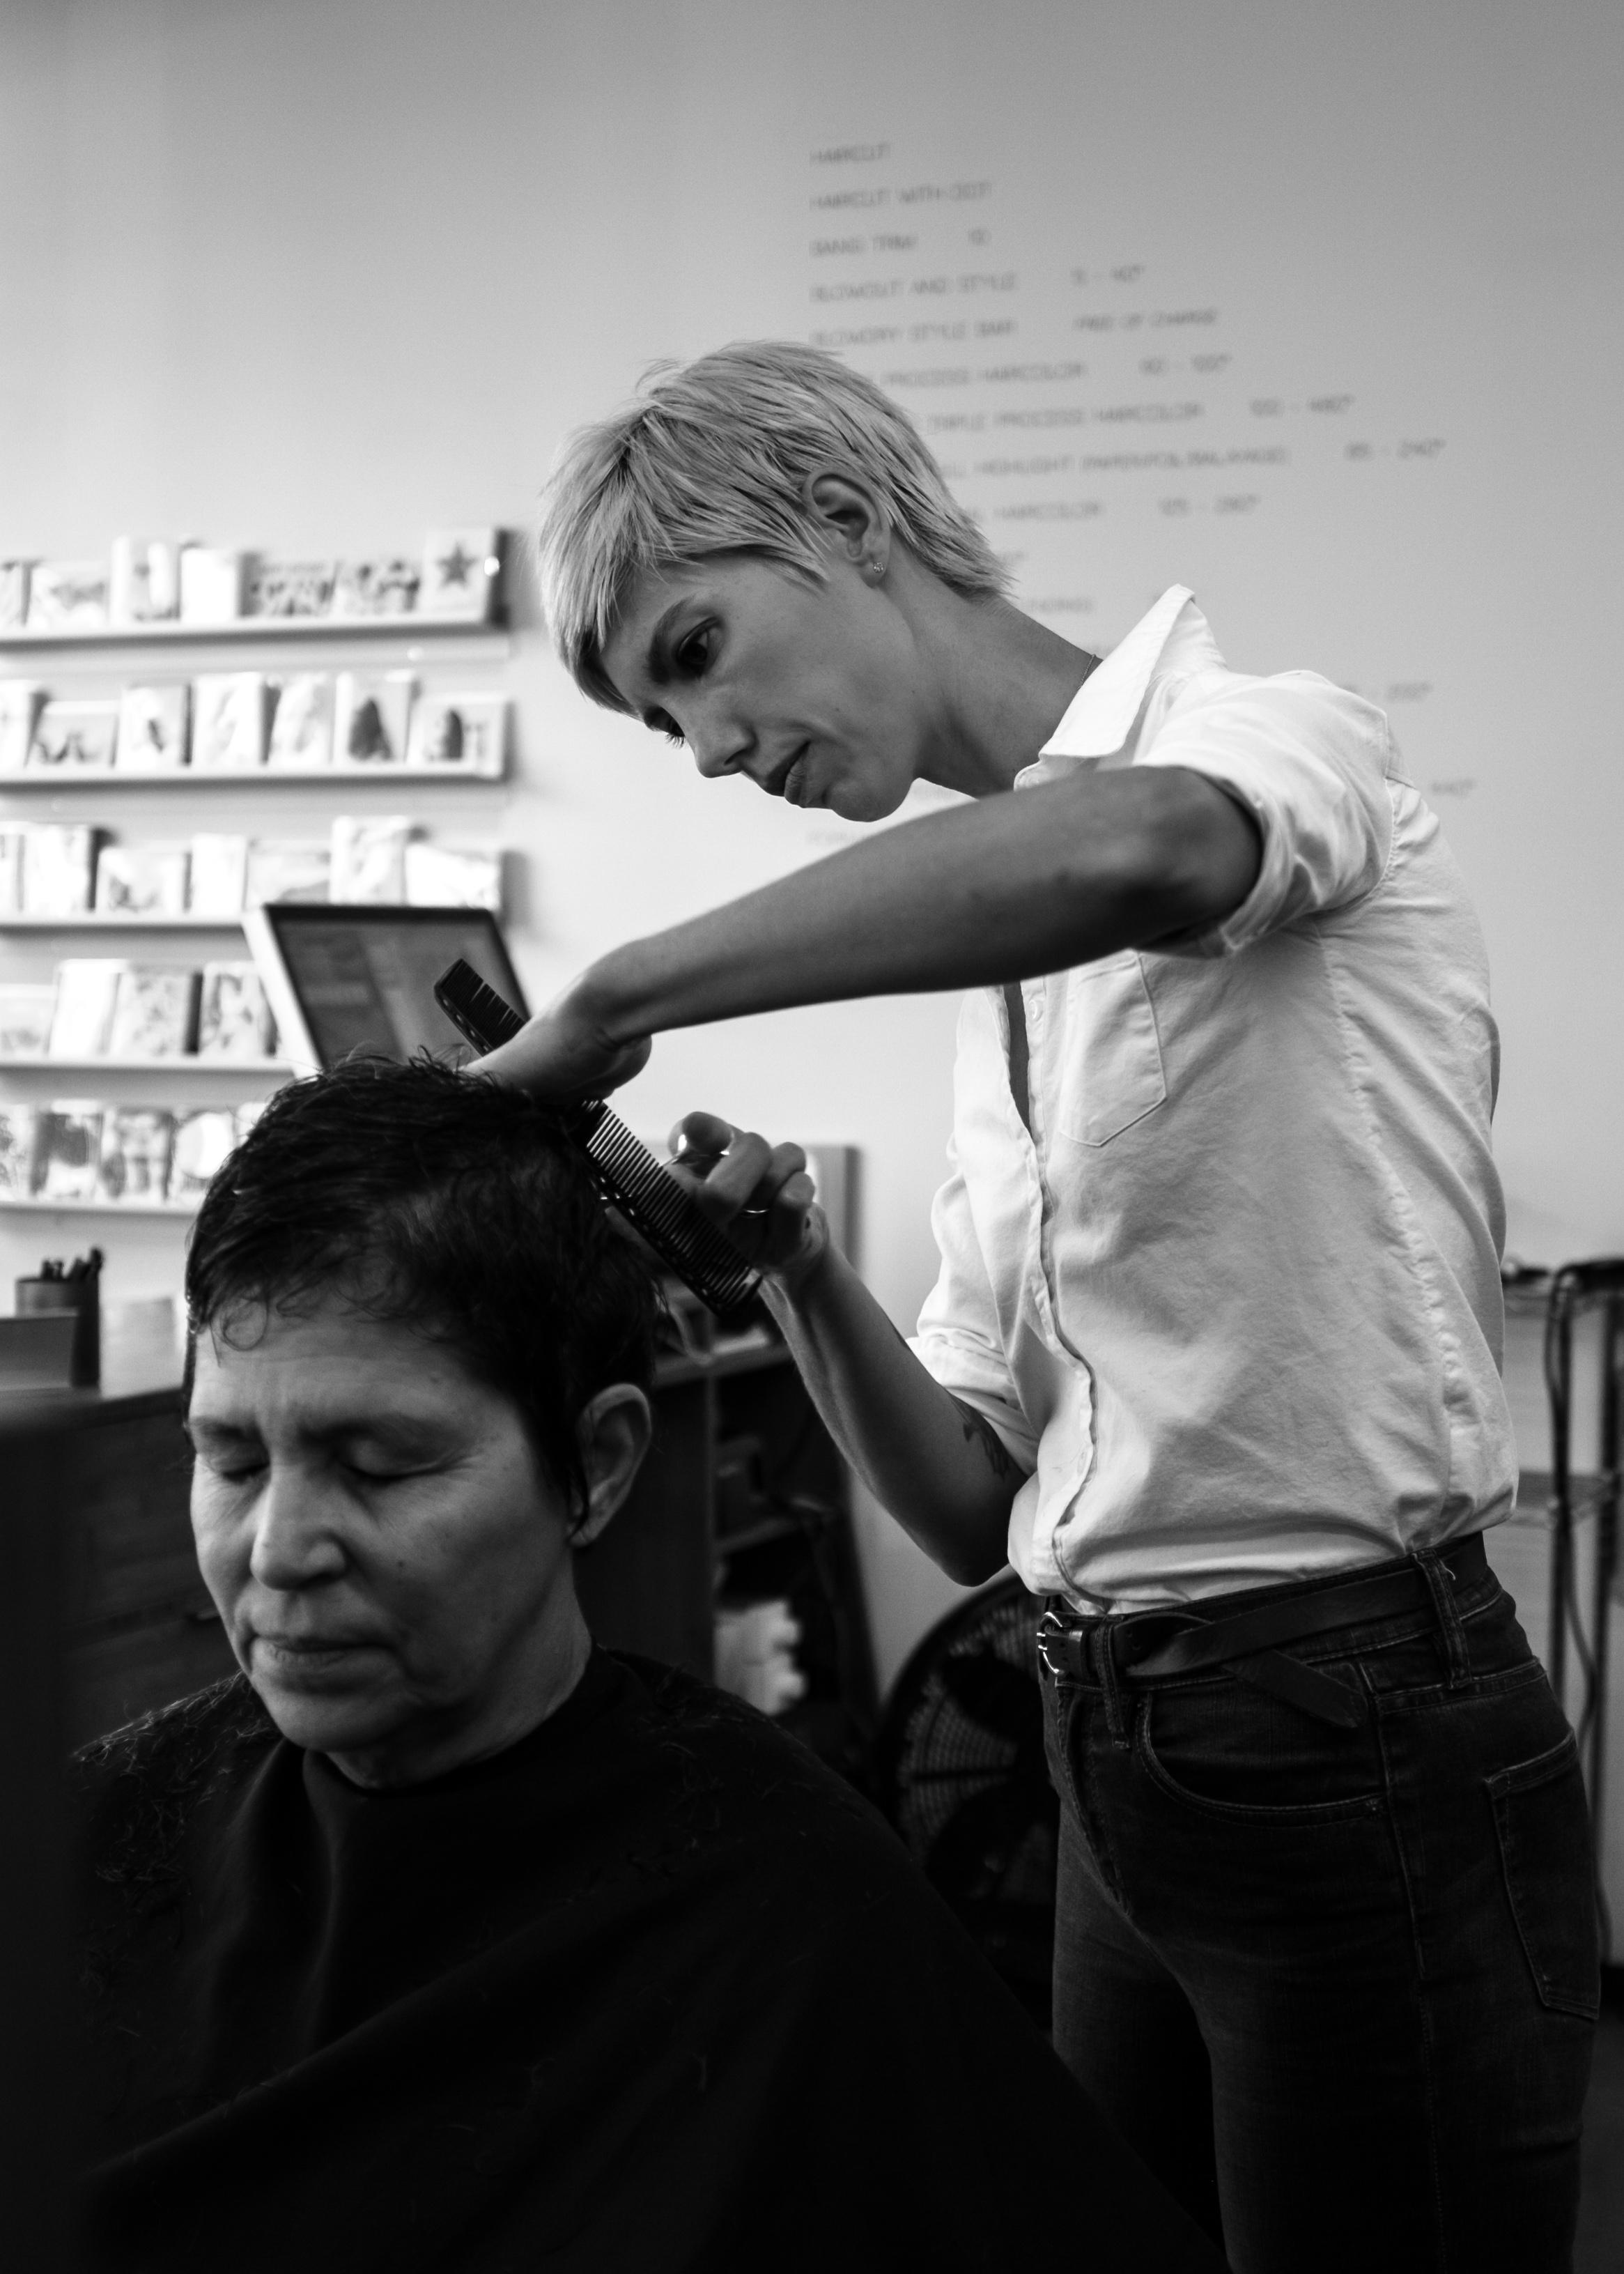 tenpachi Seattle hair hairstylist